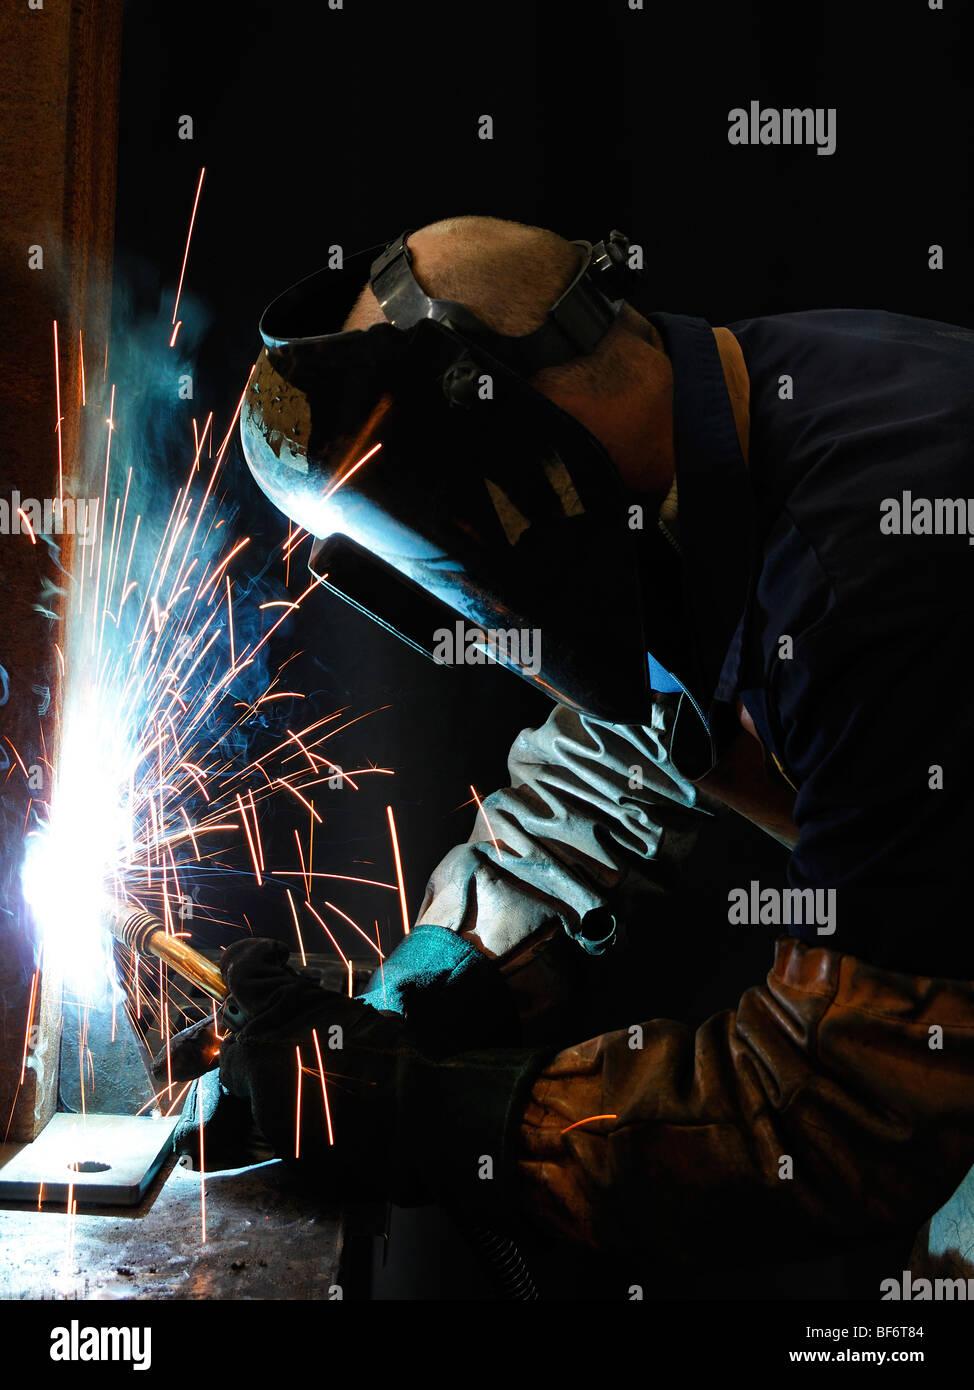 Welder Welding at an Engineering Works - Stock Image